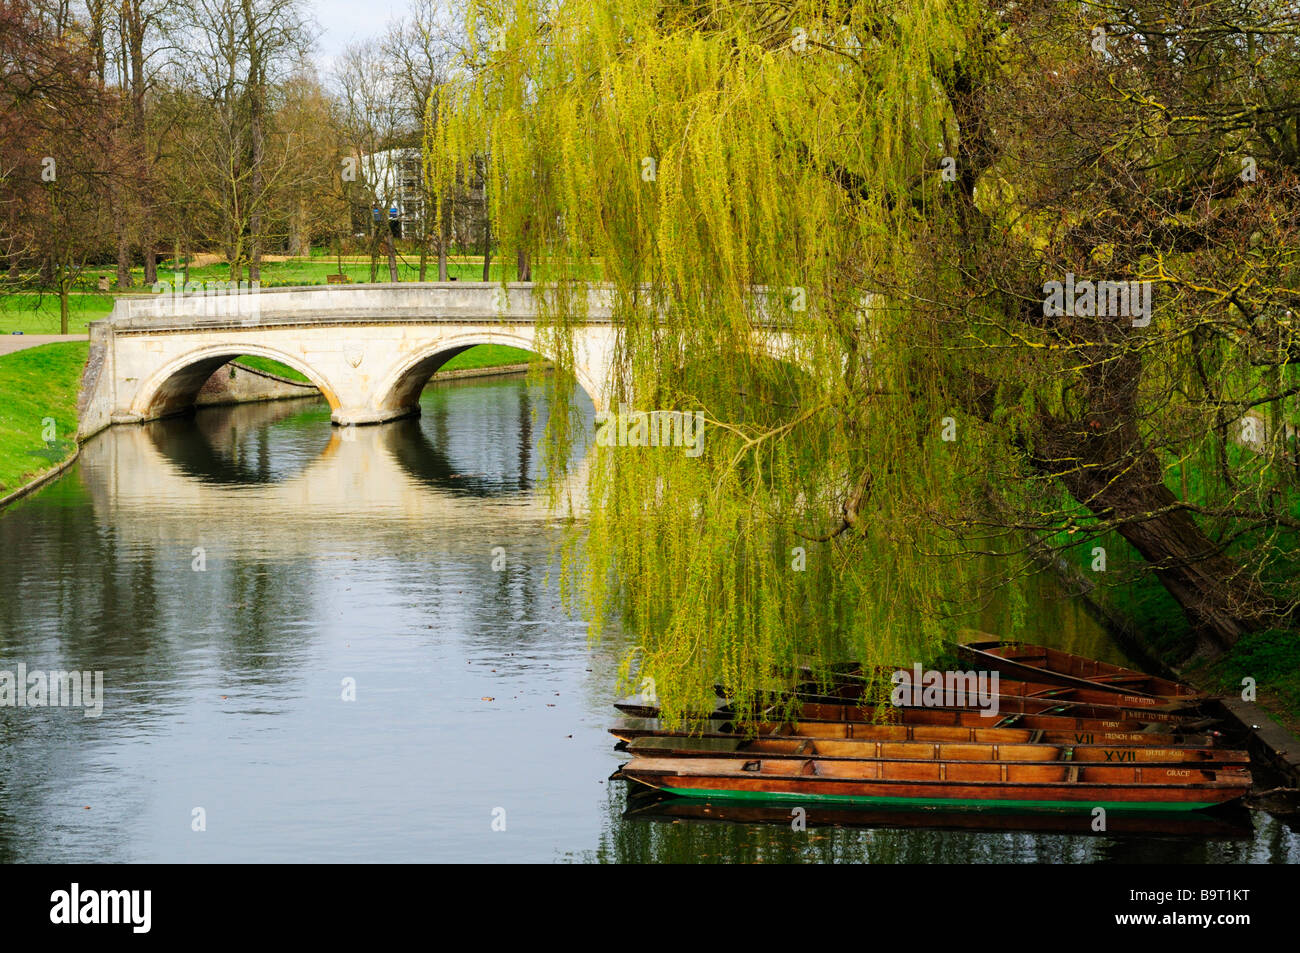 Trinity Bridge and the River Cam, Cambridge England UK - Stock Image